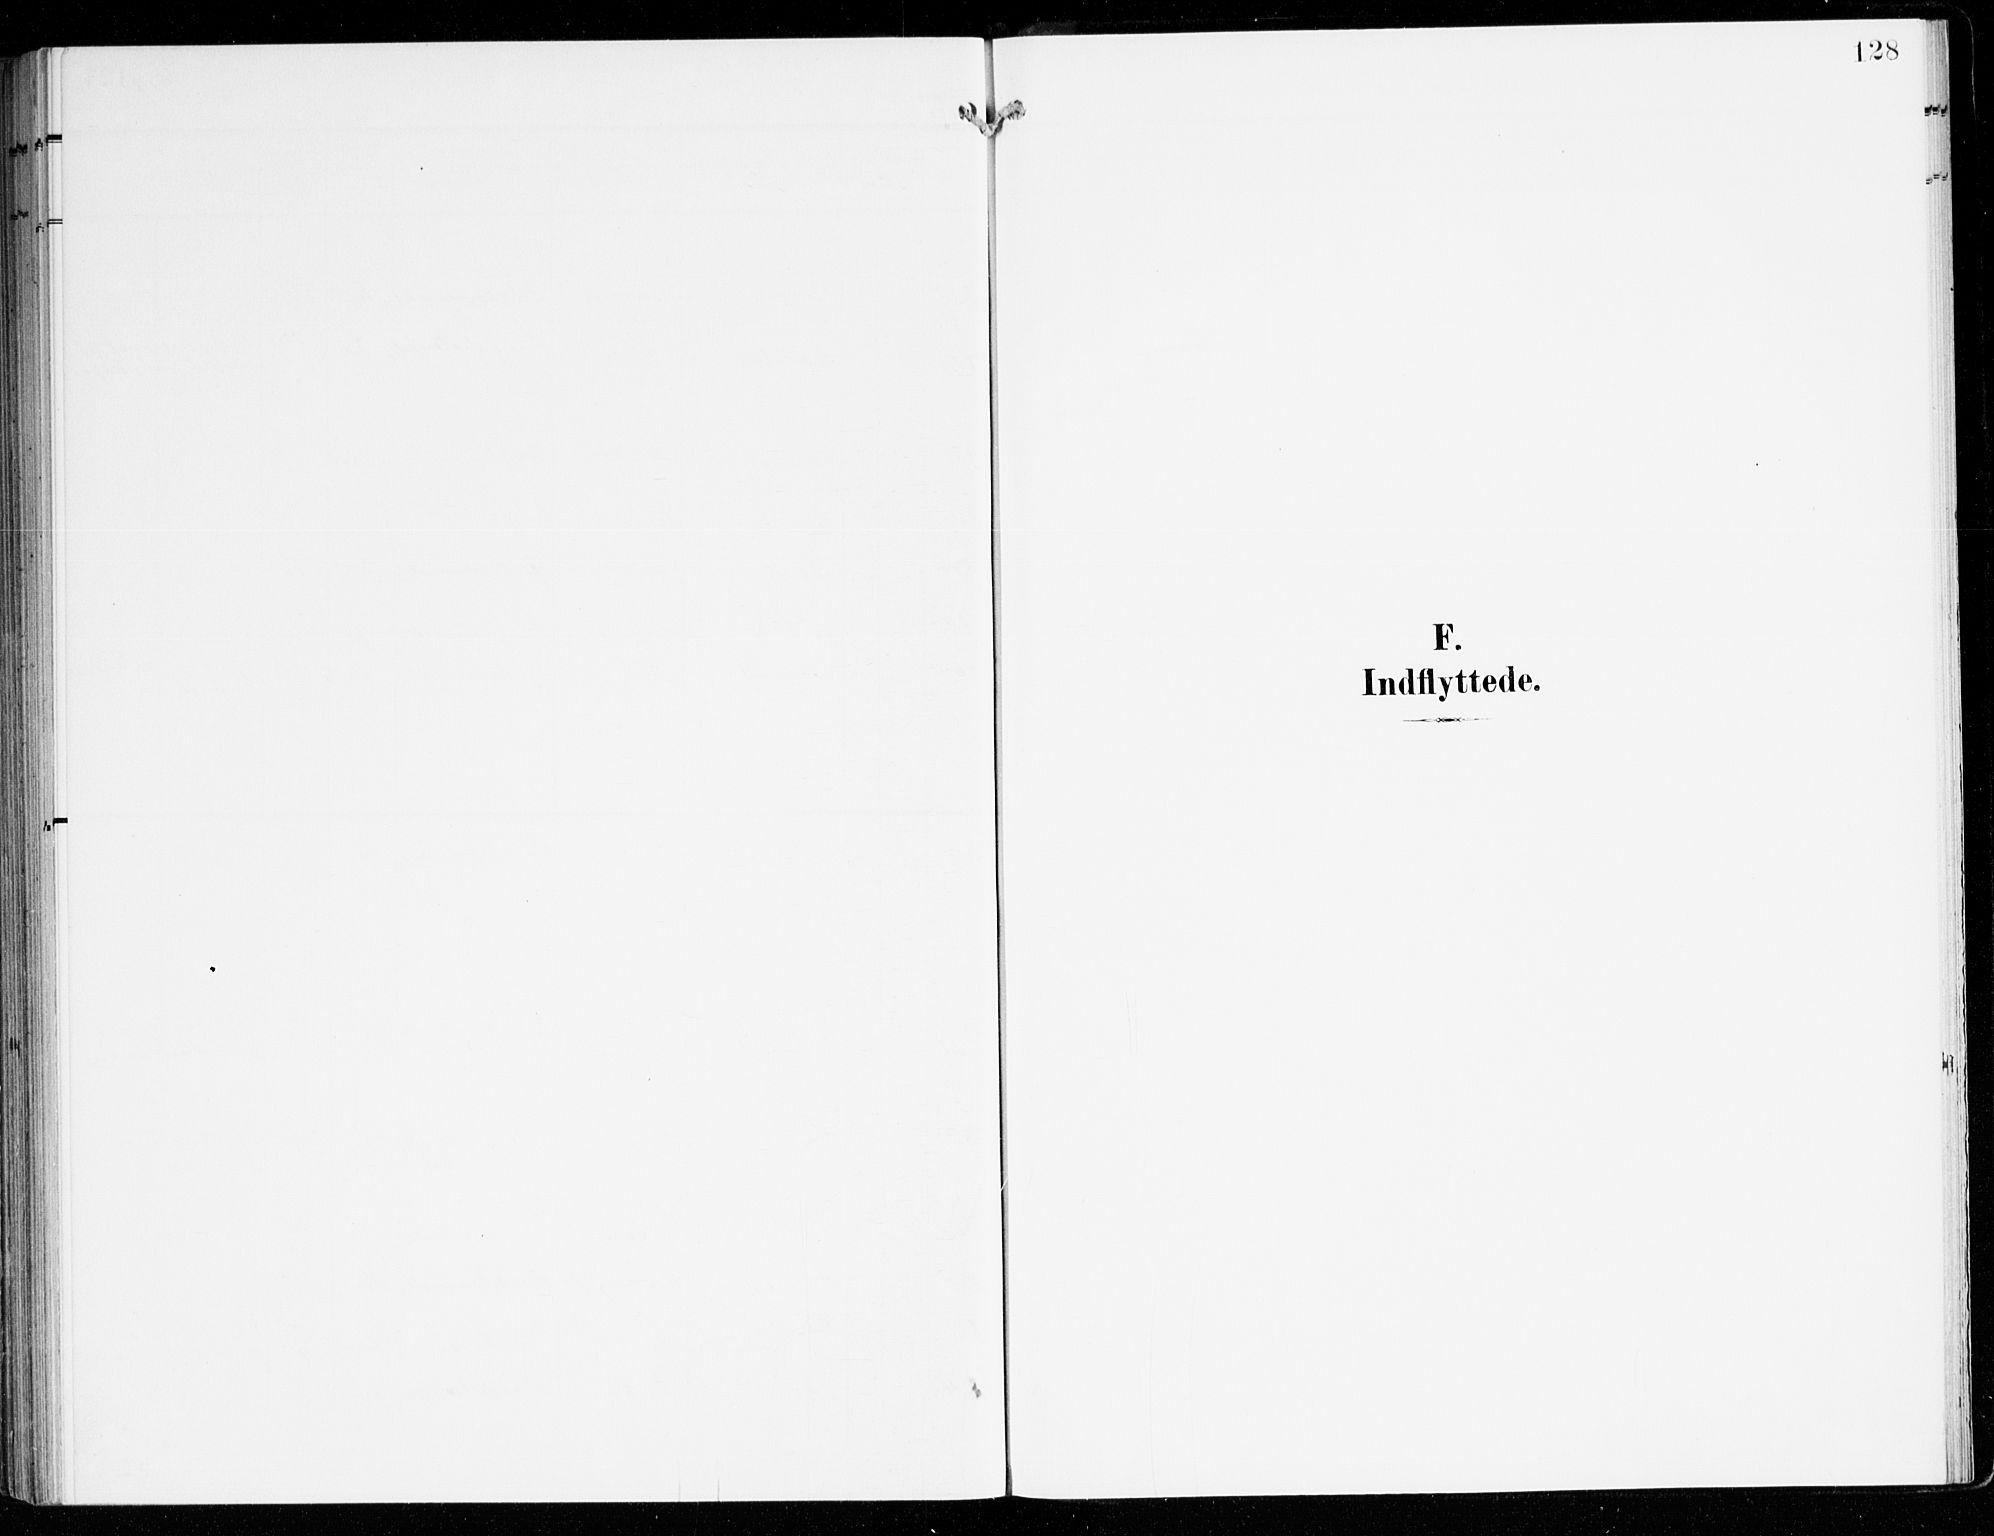 SAB, Hyllestad Sokneprestembete, Ministerialbok nr. D 2, 1905-1919, s. 128